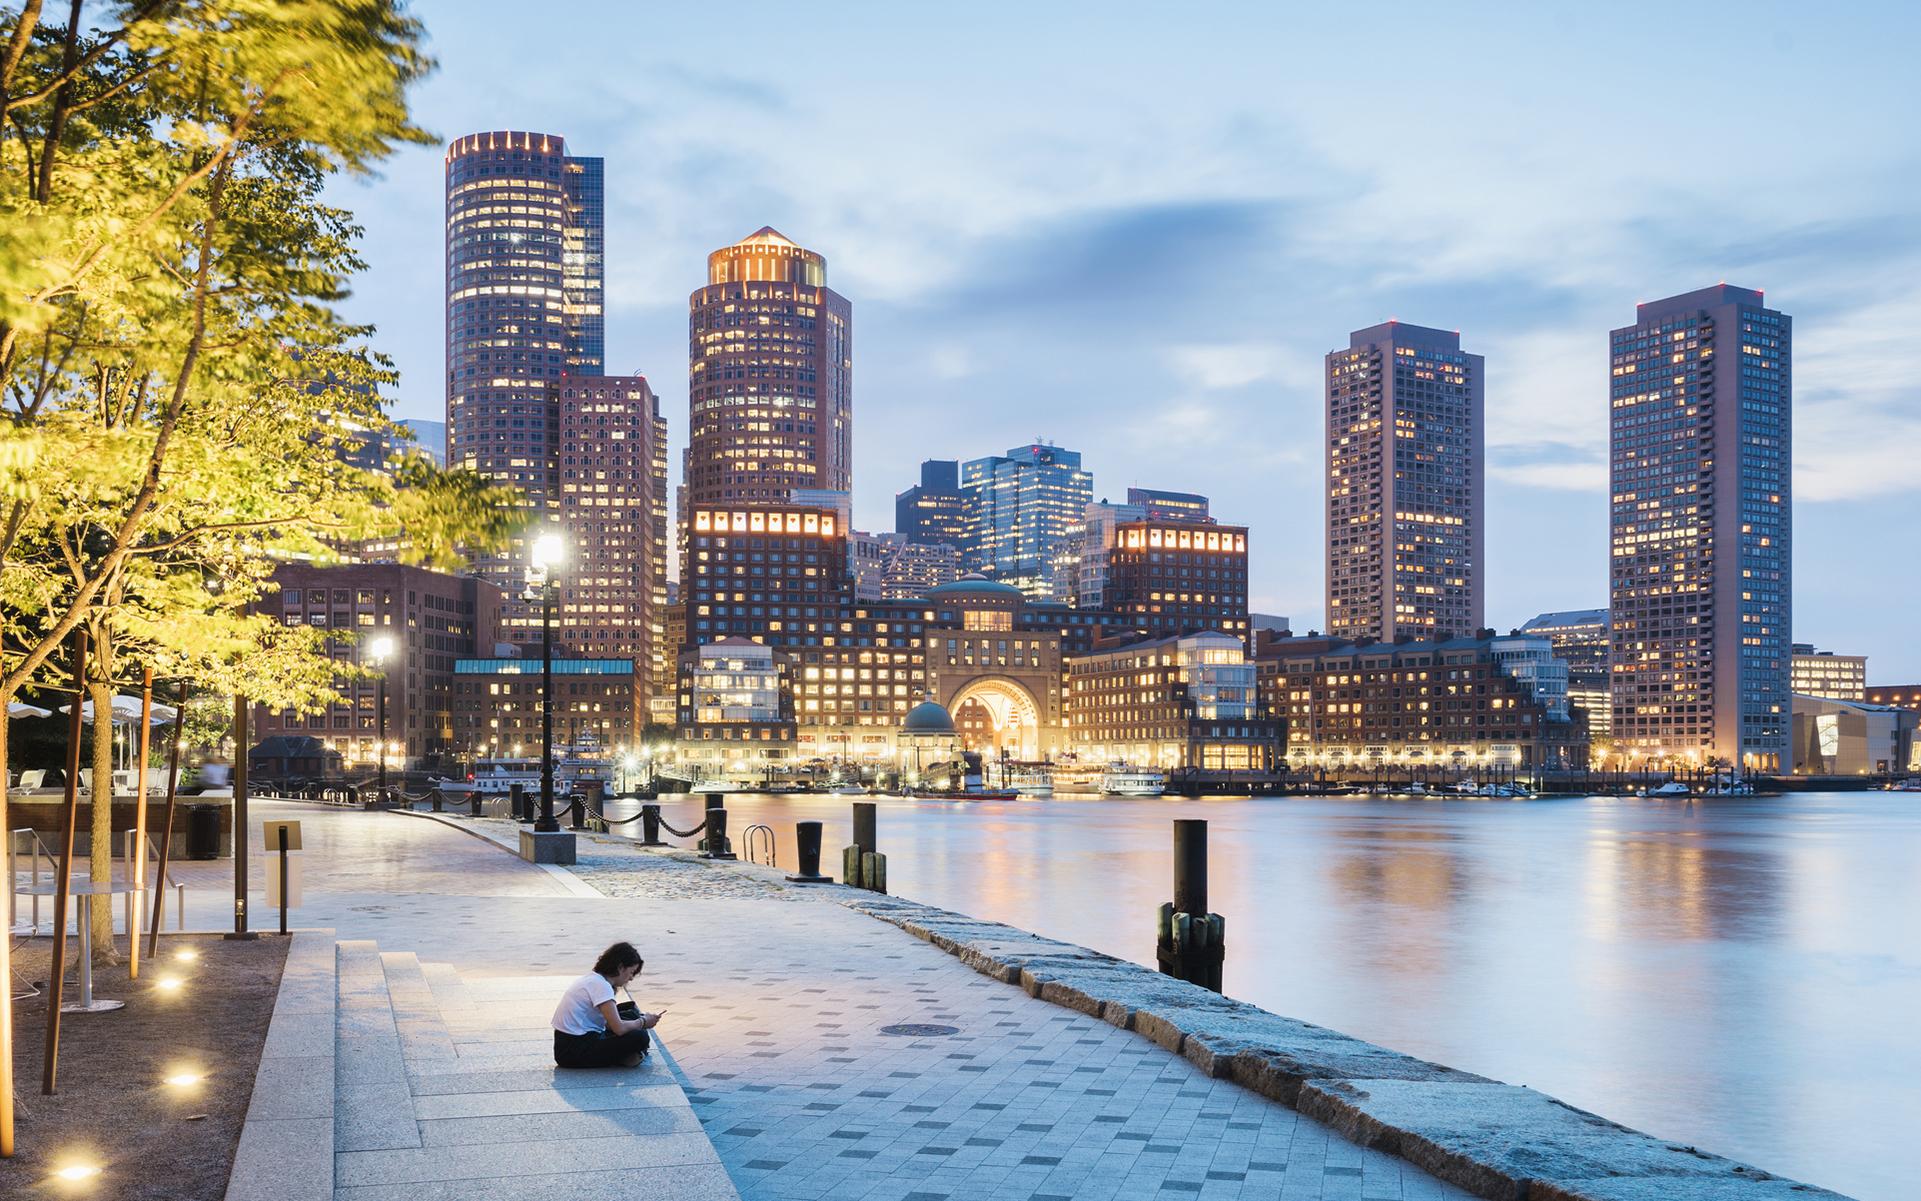 MAssachusetts and Vermont marijuana legalization rules starting july 1